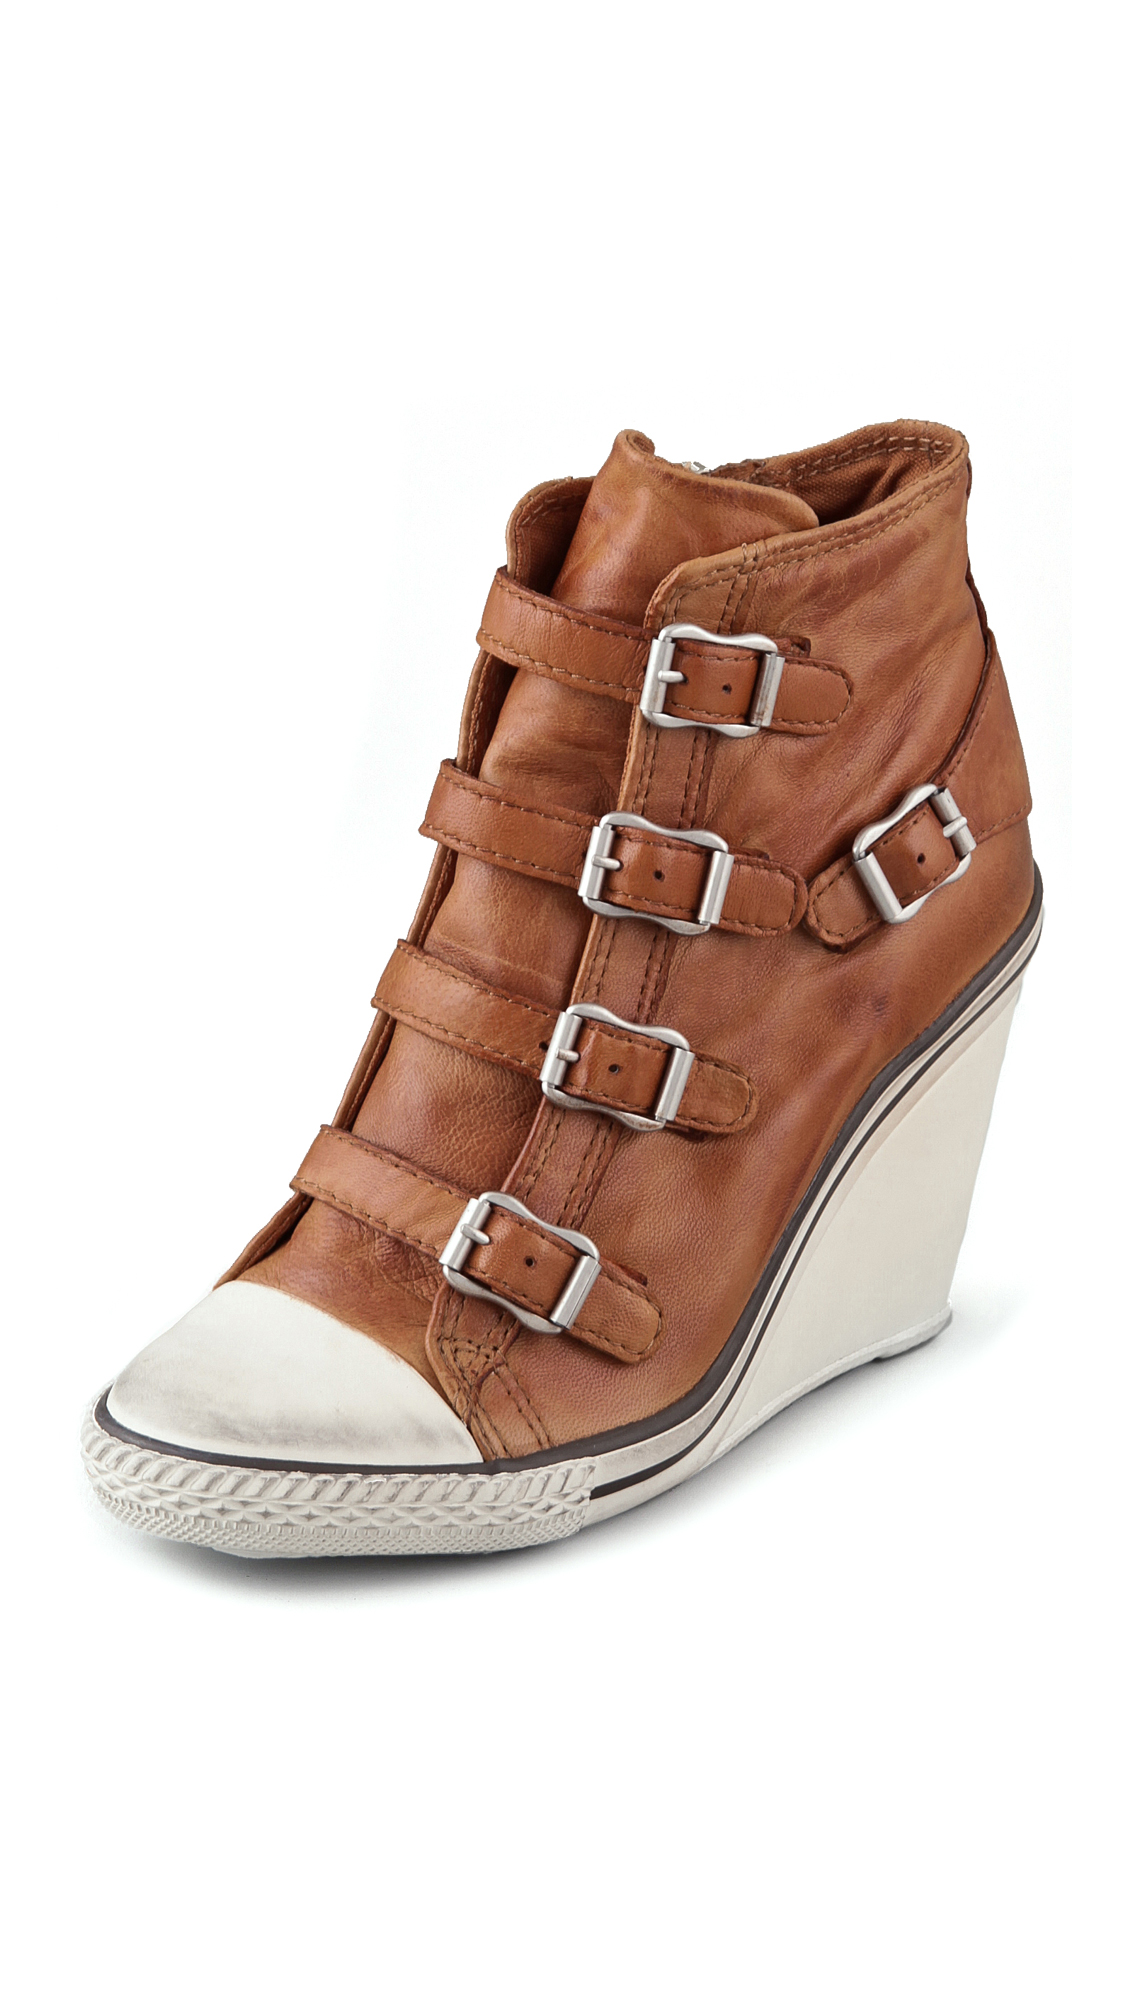 70e0971705f9 Ash Thelma Wedge Sneakers